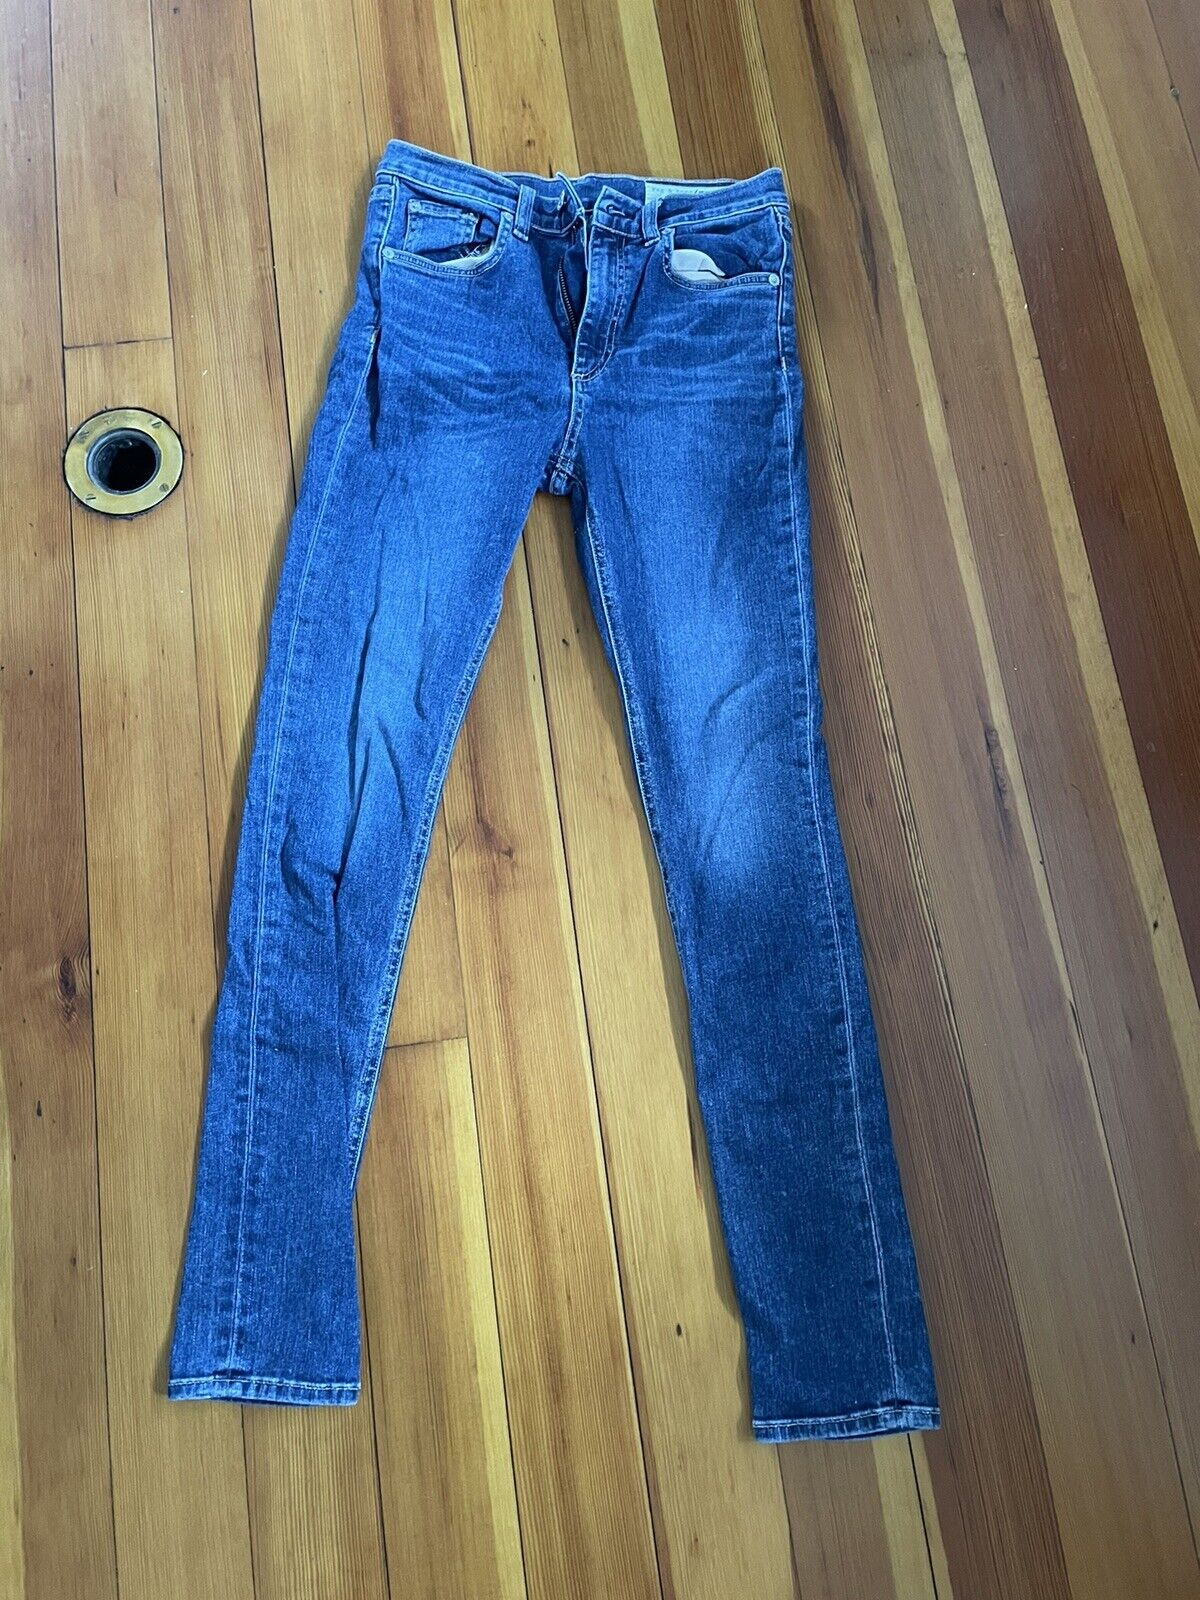 rag and bone jeans 27 Skinny - image 1